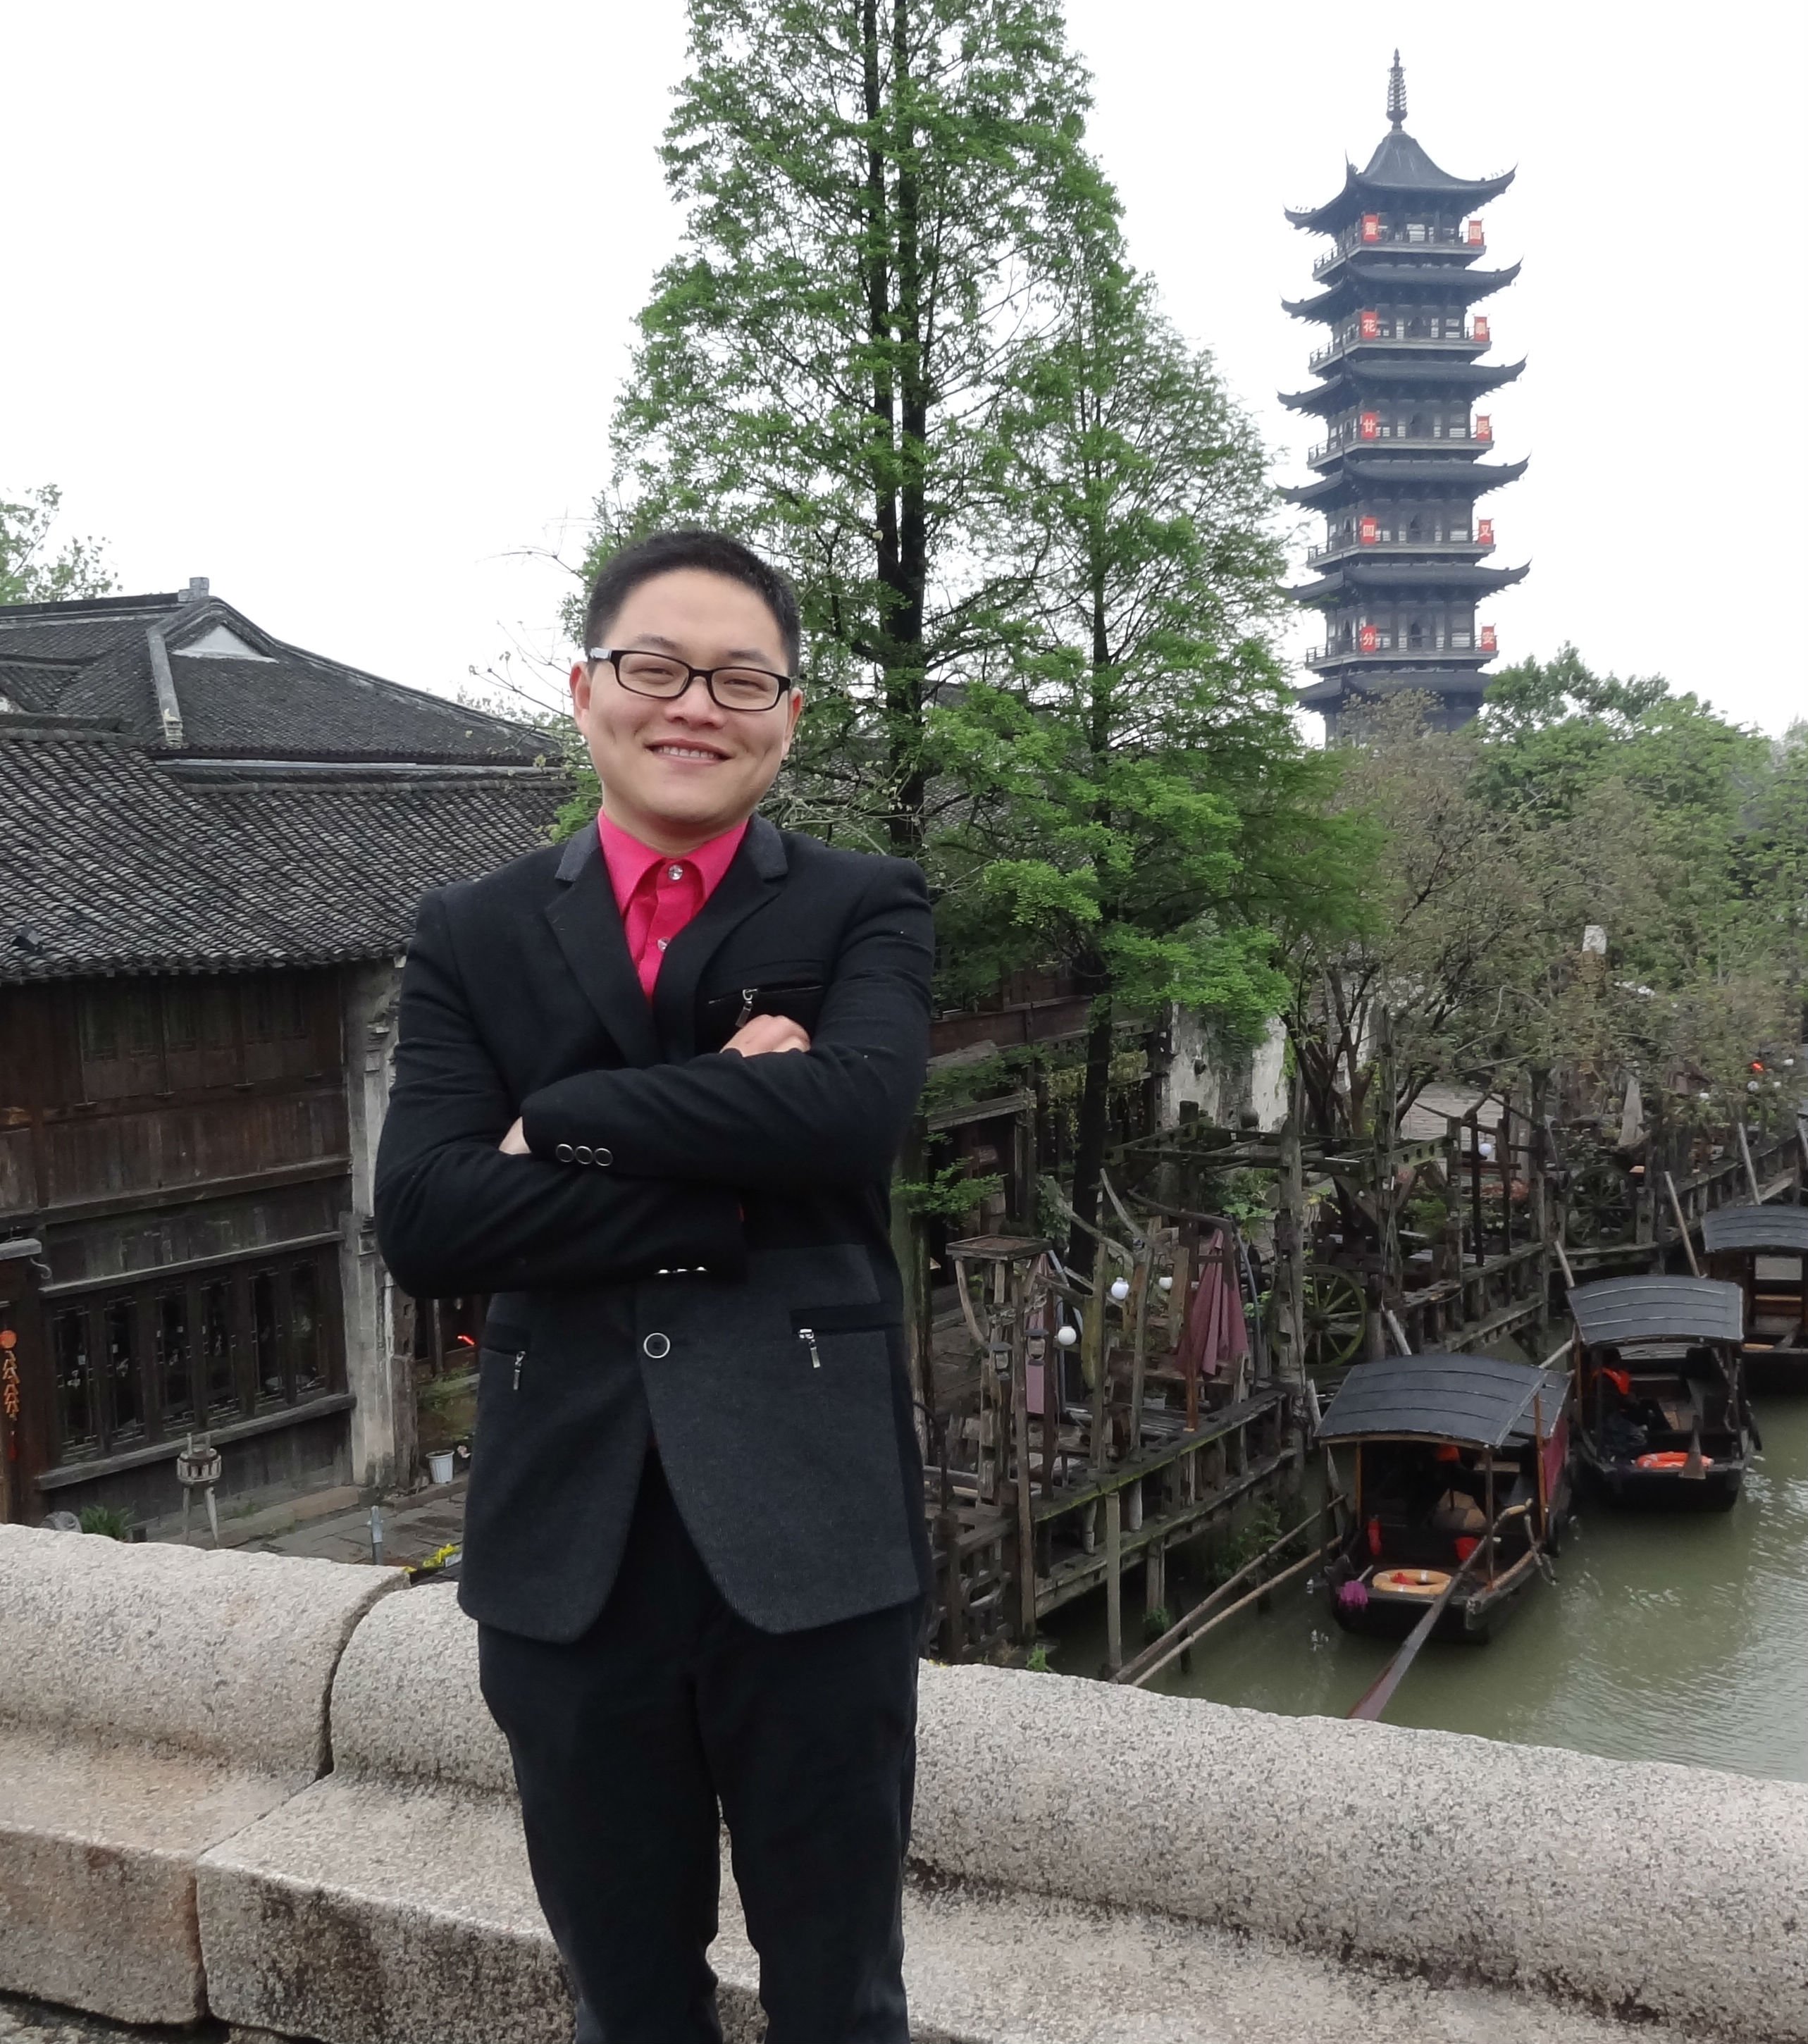 "Dr. Xing-Hai Liu <br/>College of Chemical Engineering and Materials Science, Zhejiang University of Technology, Hangzhou, 310014, P.R. China<br/>Email: <a href=""mailto:xhliu@zjut.edu.cn"">xhliu@zjut.edu.cn</a>"